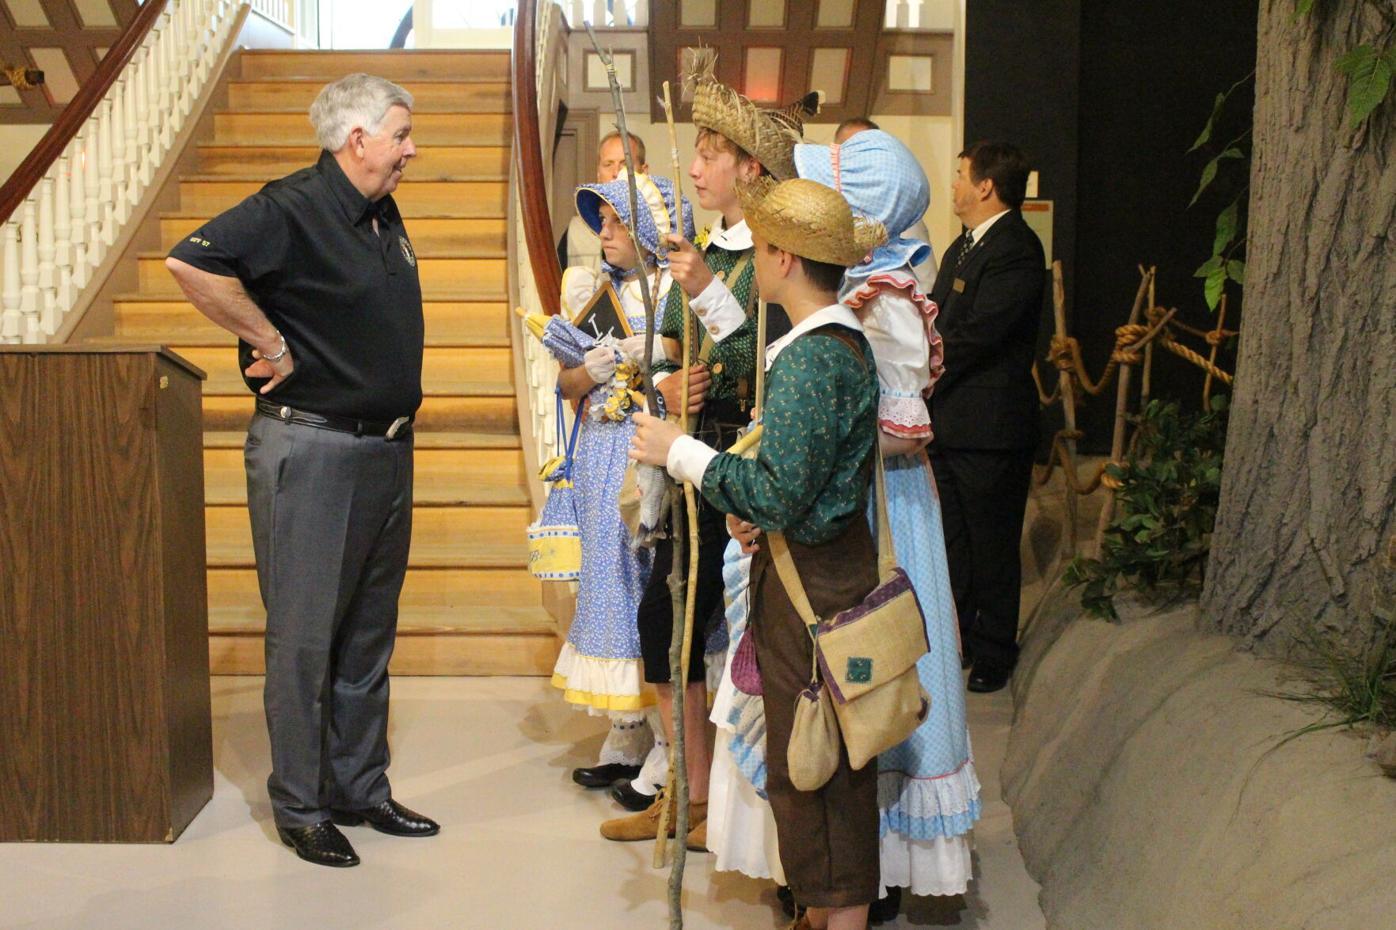 Gov. Parson visits America's Hometown on Bicentennial Tour